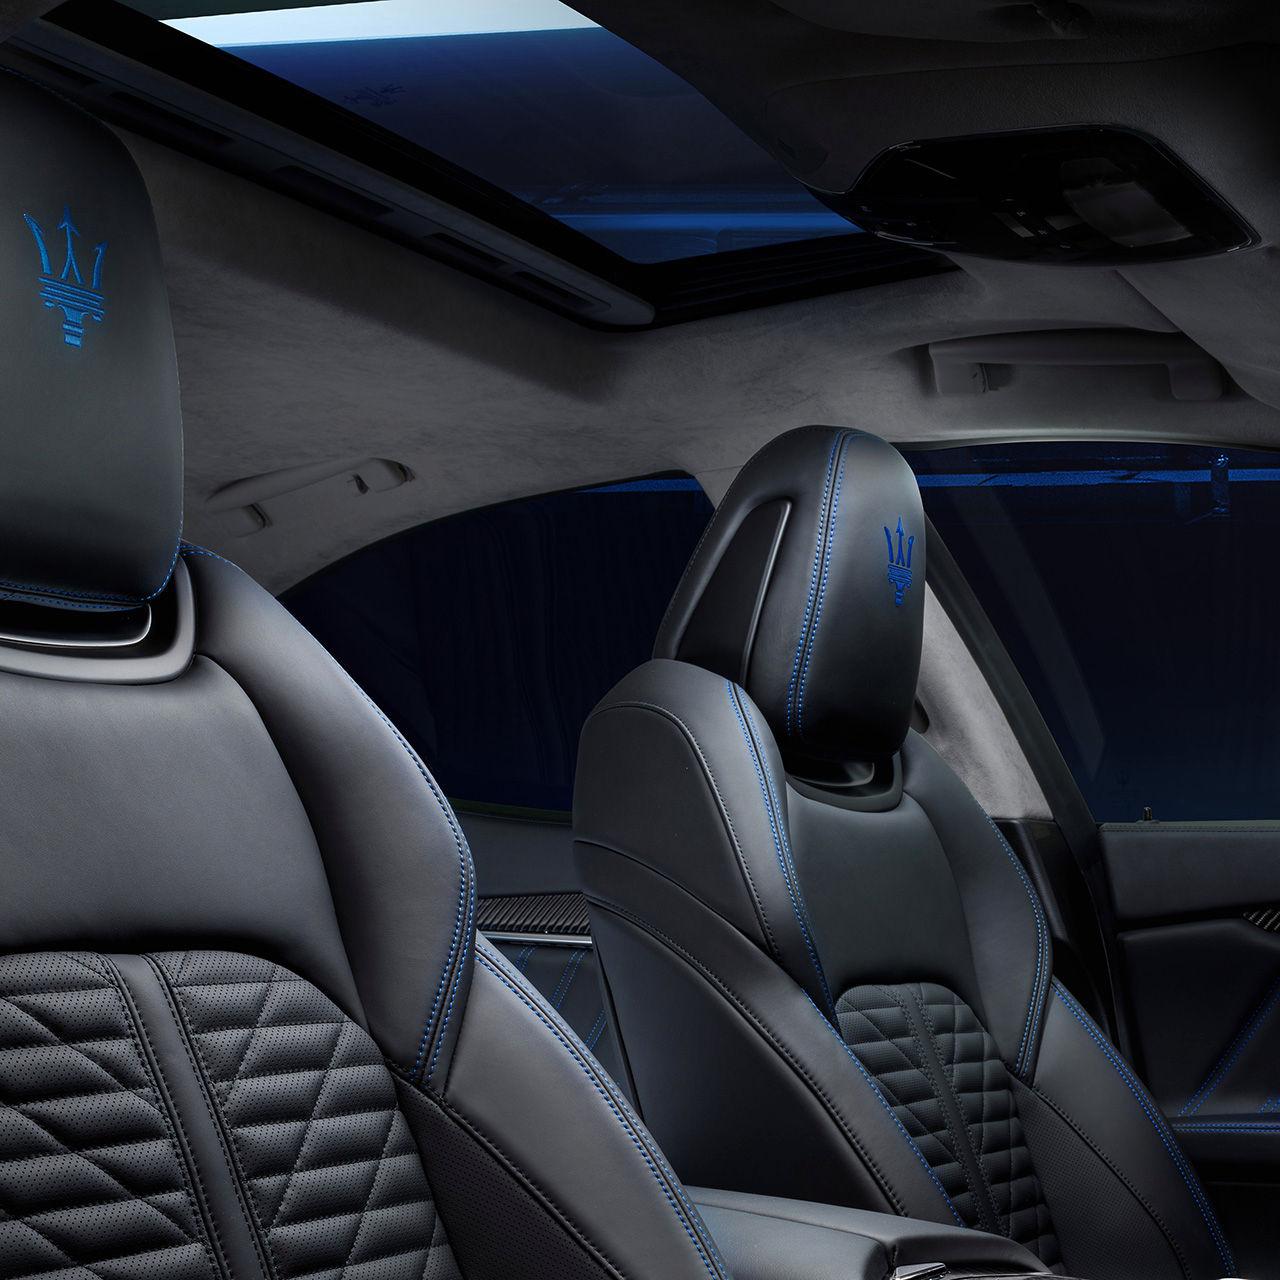 Maserati Ghibli - Design - Interieur - Vordersitze - Nahaufnahme